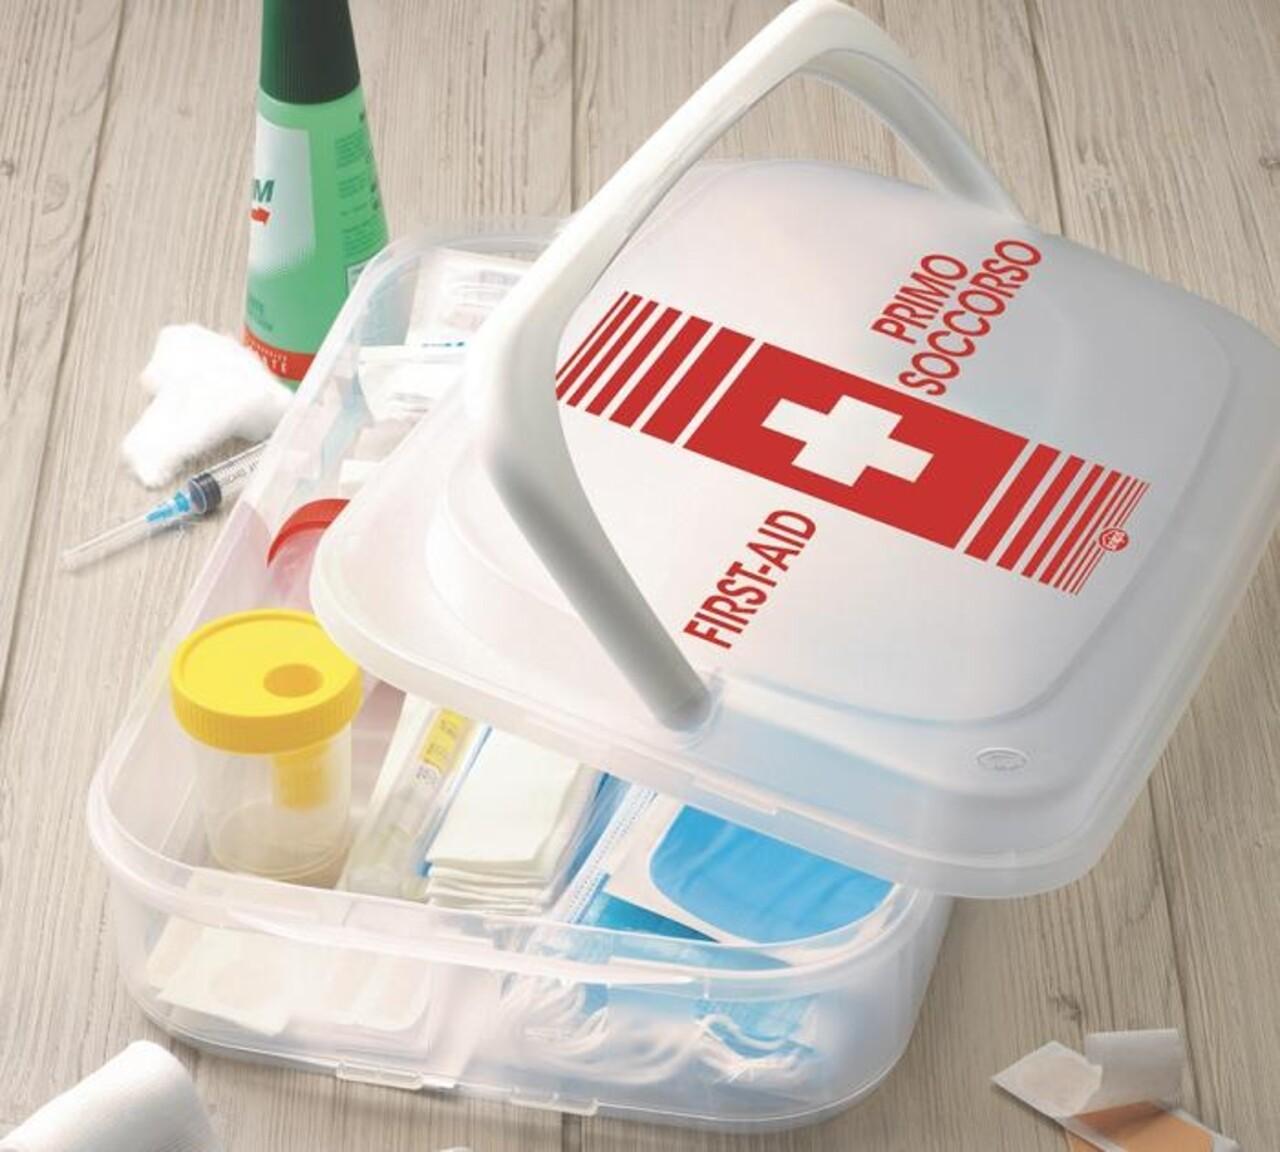 Trusa prim ajutor, Snips, First Aid Box, 43 x 27.5 x 11 cm, polipropilena